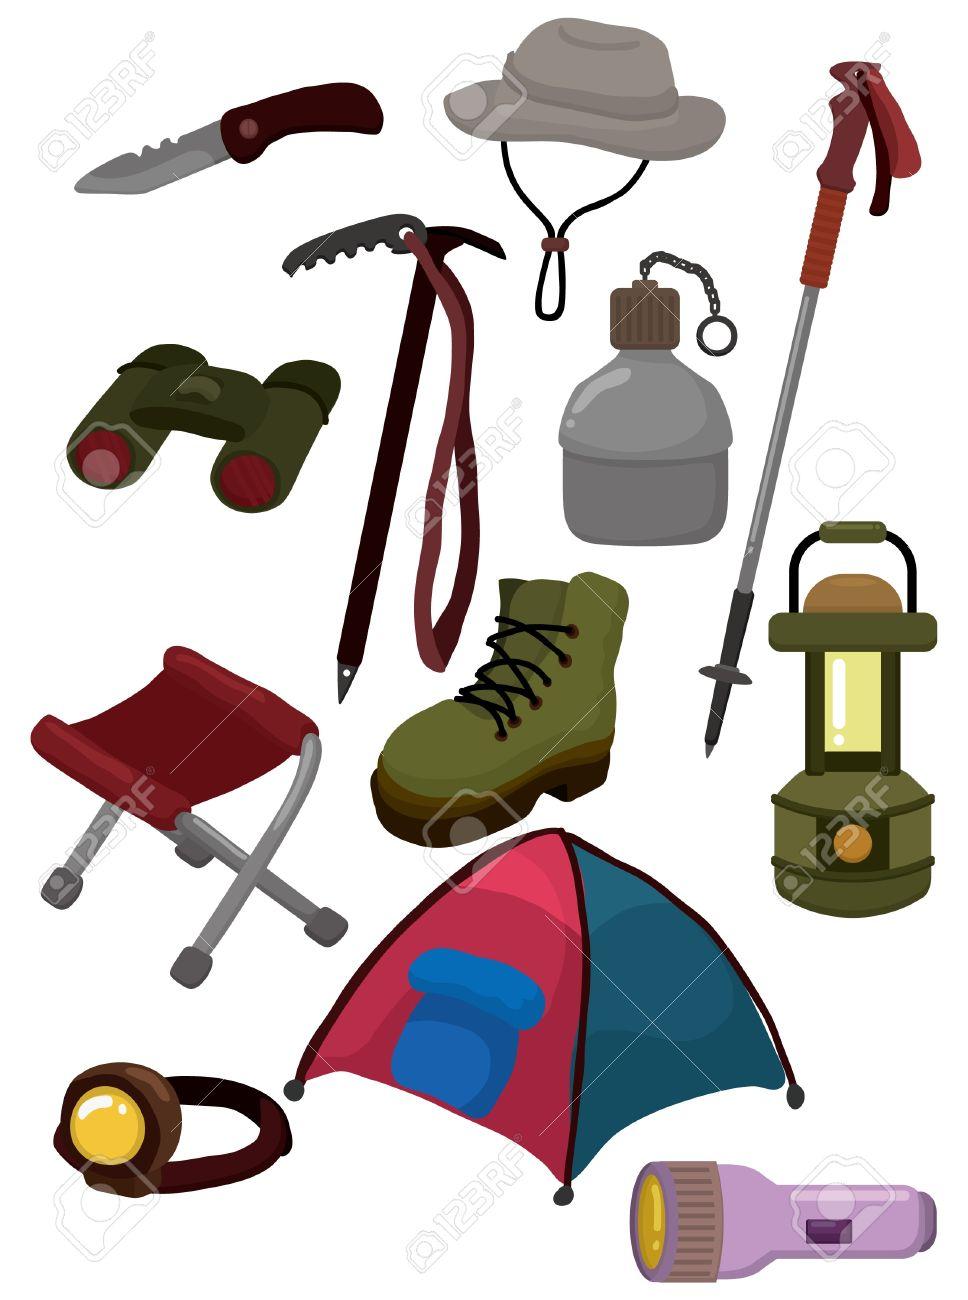 Cartoon Climb Equipment Icon Royalty Free Cliparts, Vectors, And.